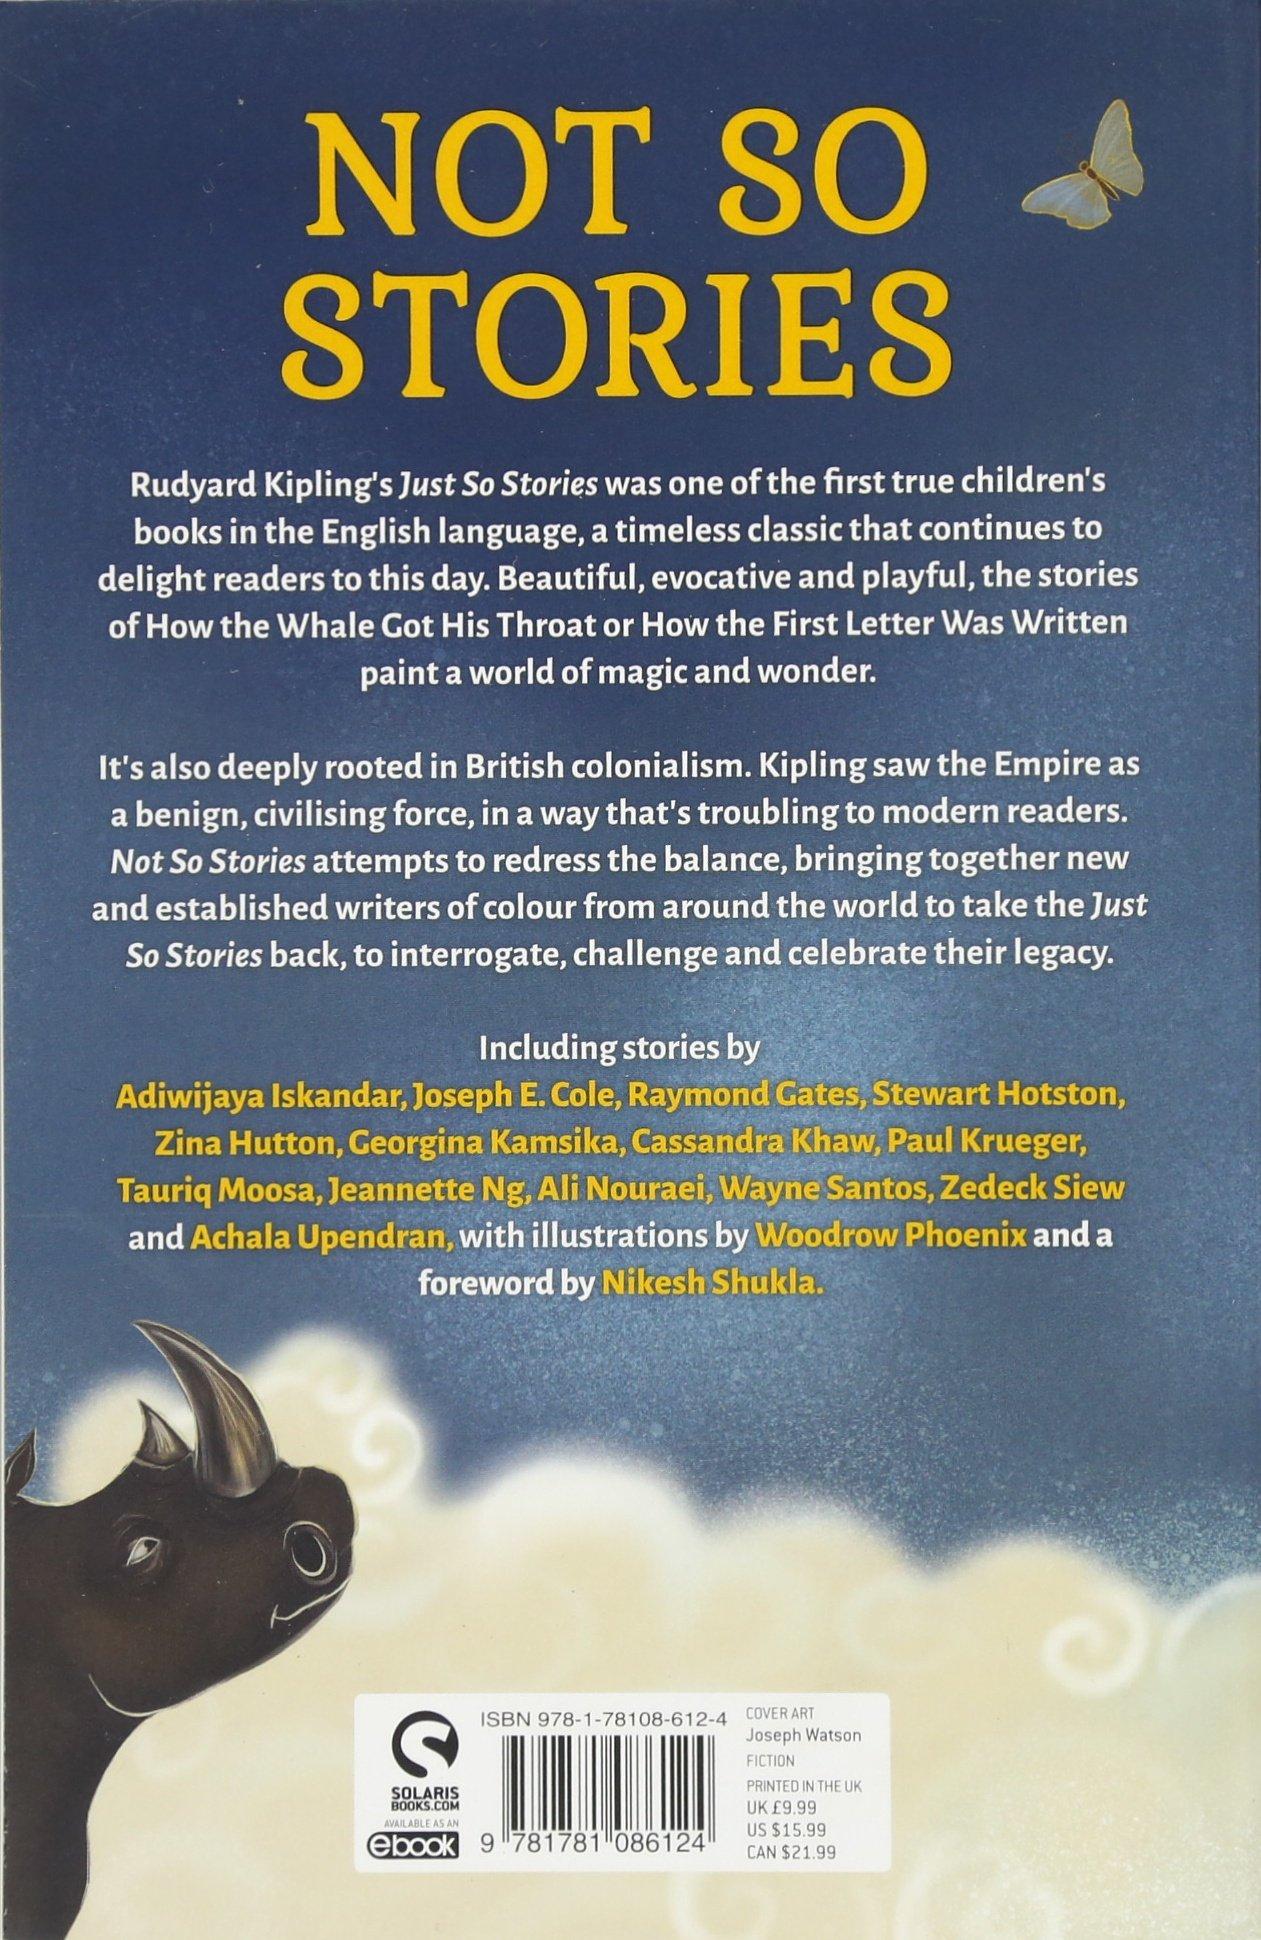 Amazon.com: Not So Stories (9781781086124): David Thomas Moore: Books